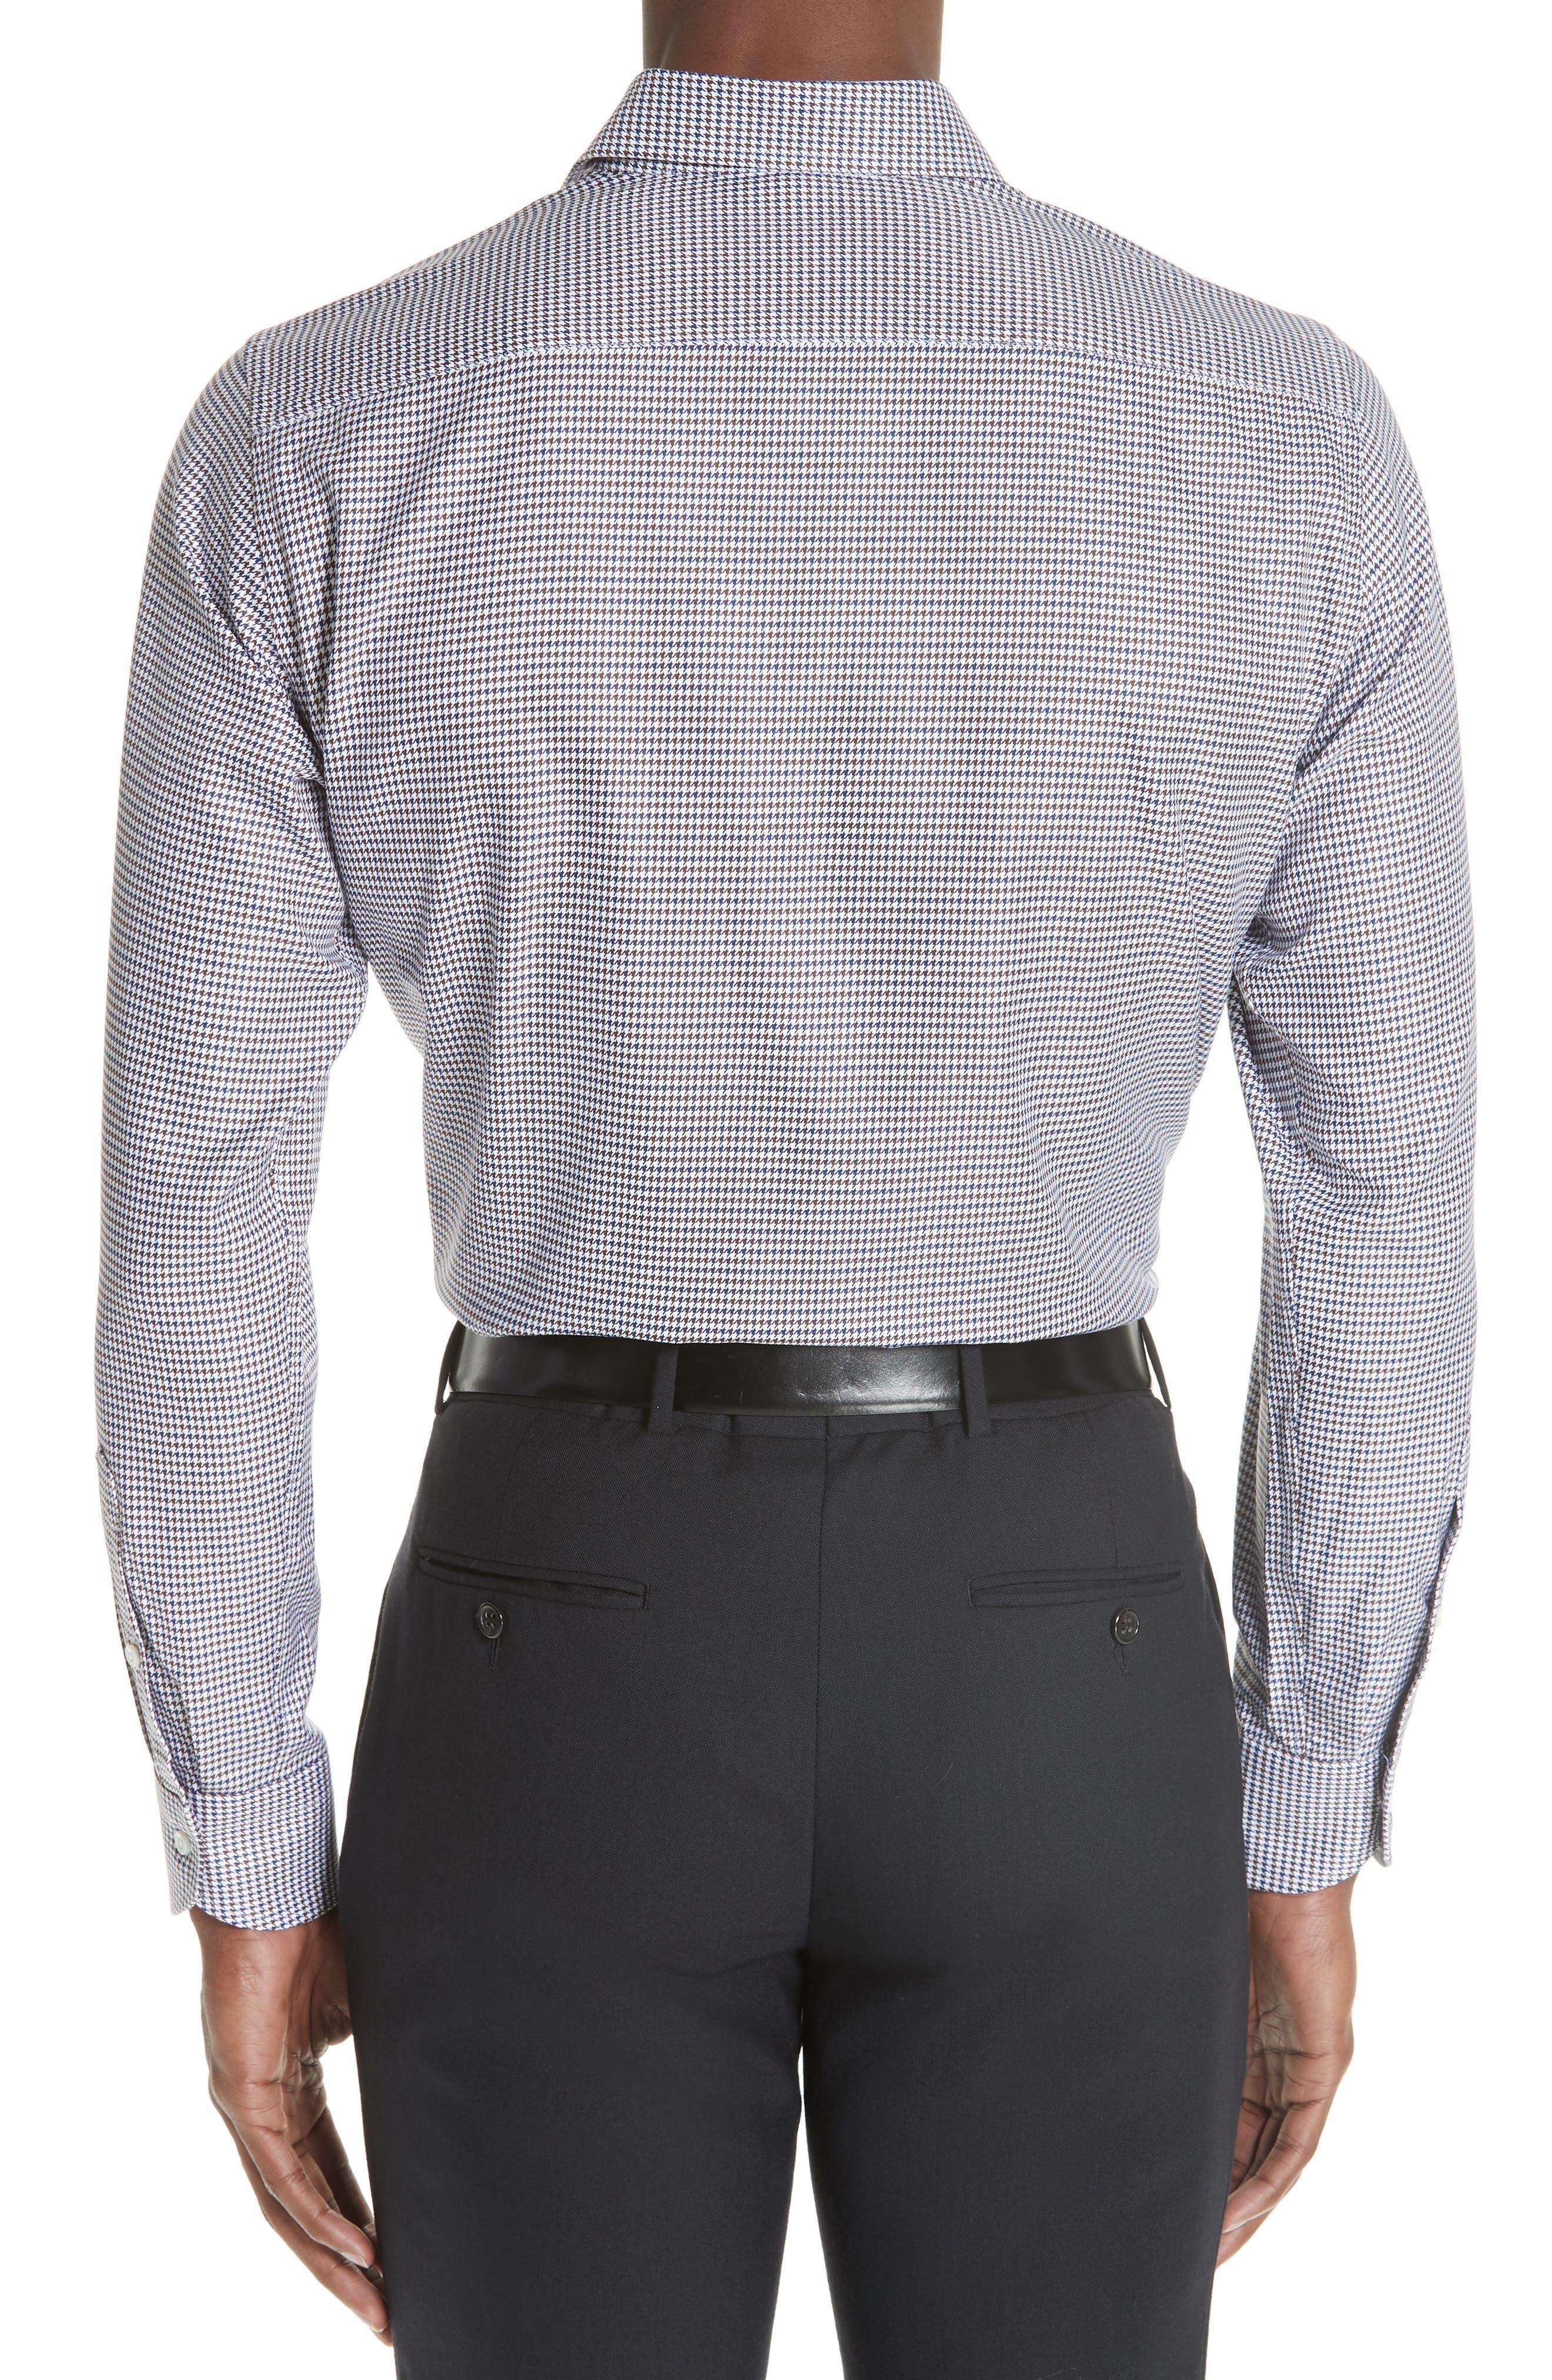 Regular Fit Houndstooth Dress Shirt,                             Alternate thumbnail 3, color,                             NAVY/ BROWN